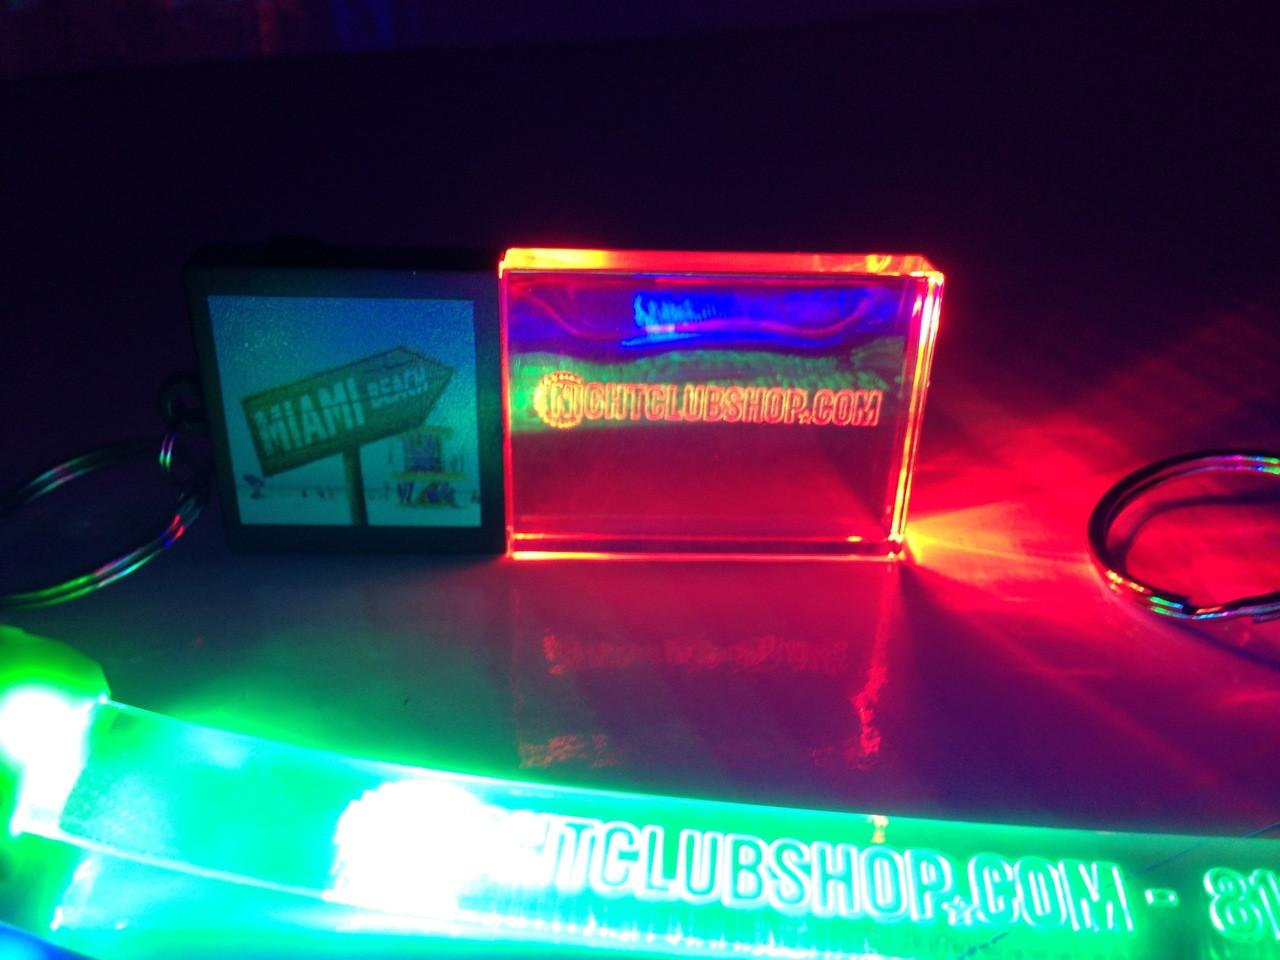 LED,Keychain,Key,chain,LED keychain, custom, BEAM, dual, print,engraved, logo,text, laser engraved,personalized,promo,merch,fundraiser,nightclub,fund raiser,sport